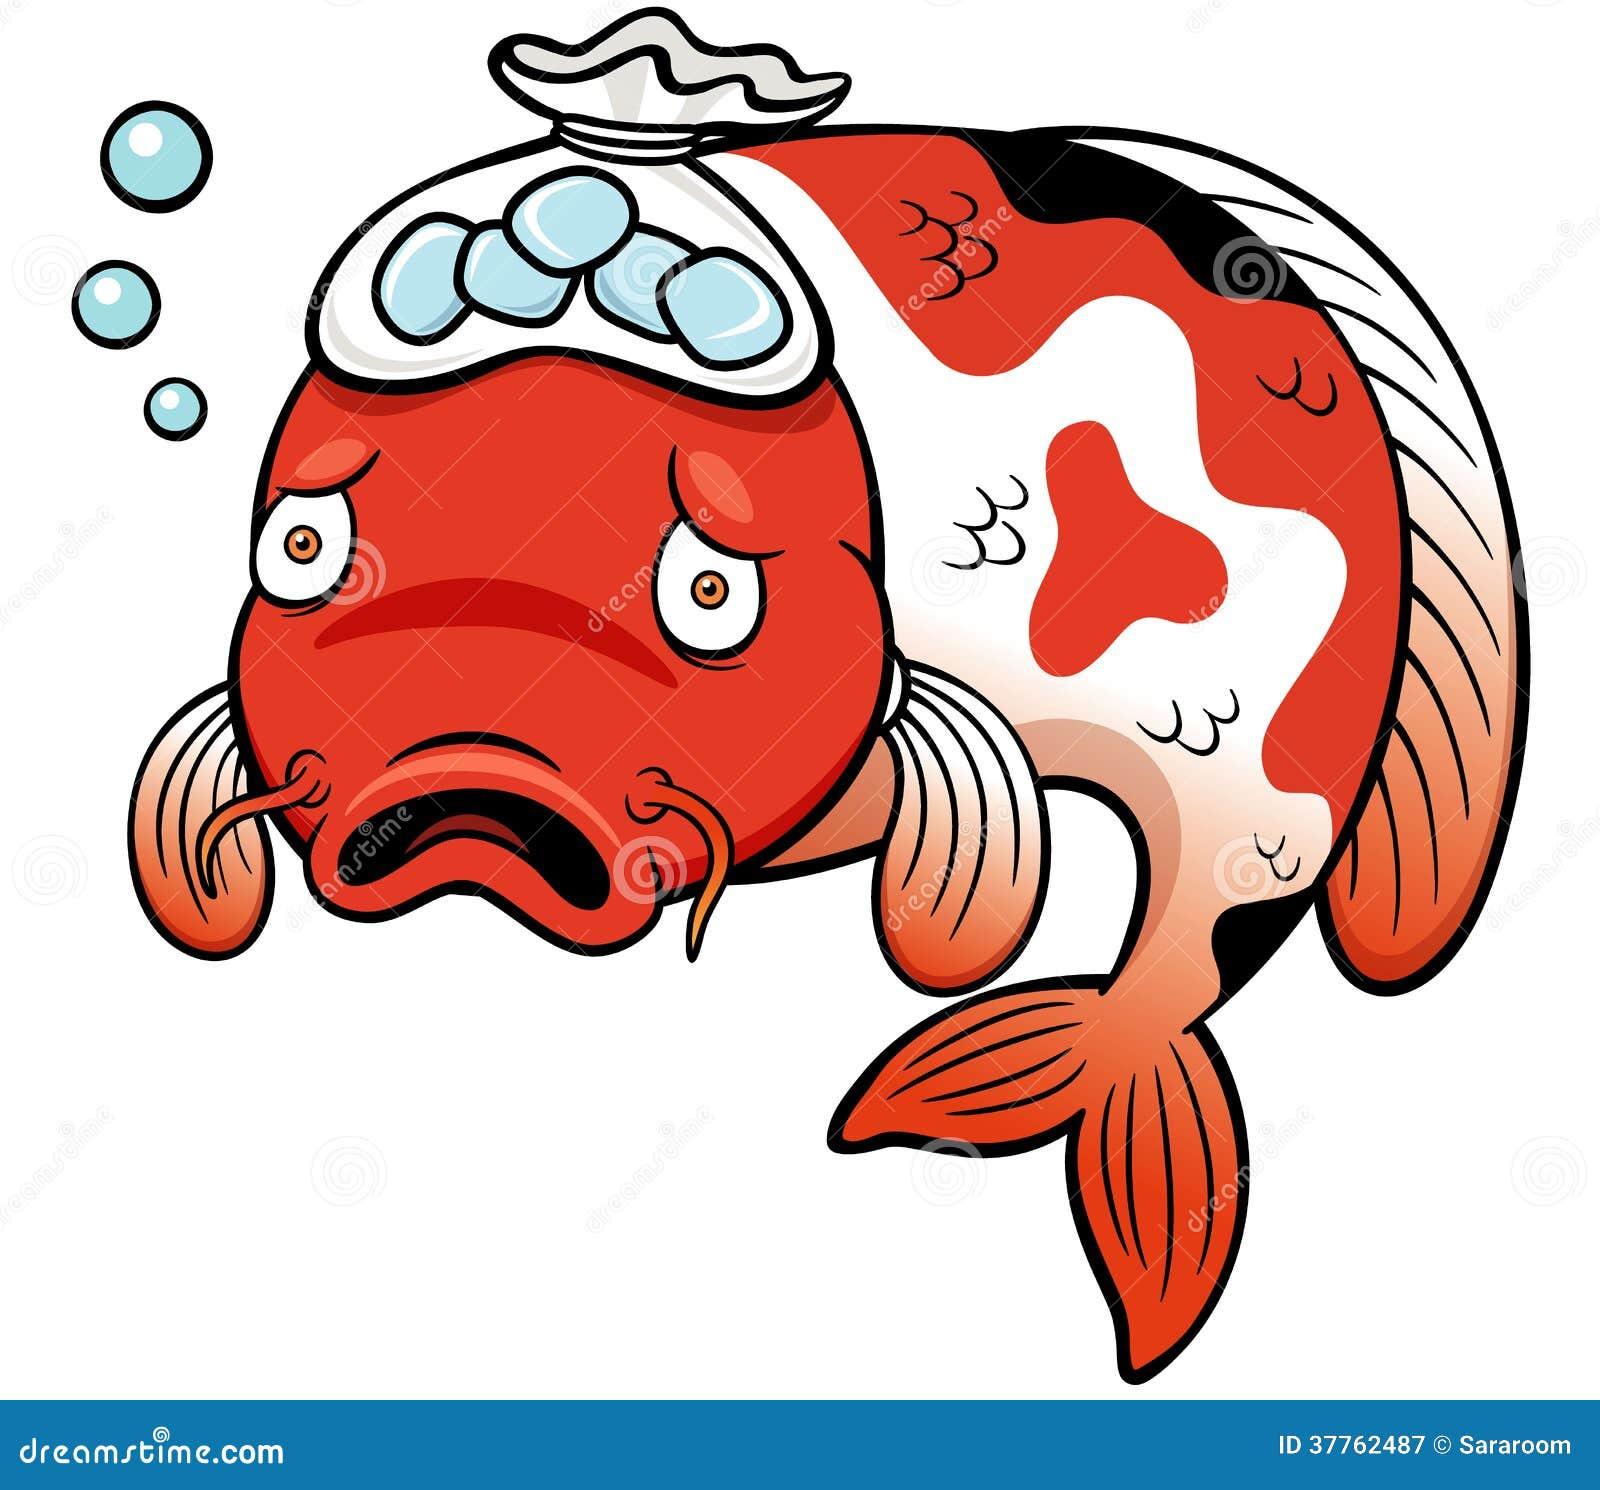 Fish sick cartoon stock vector illustration of sick for Sick koi fish